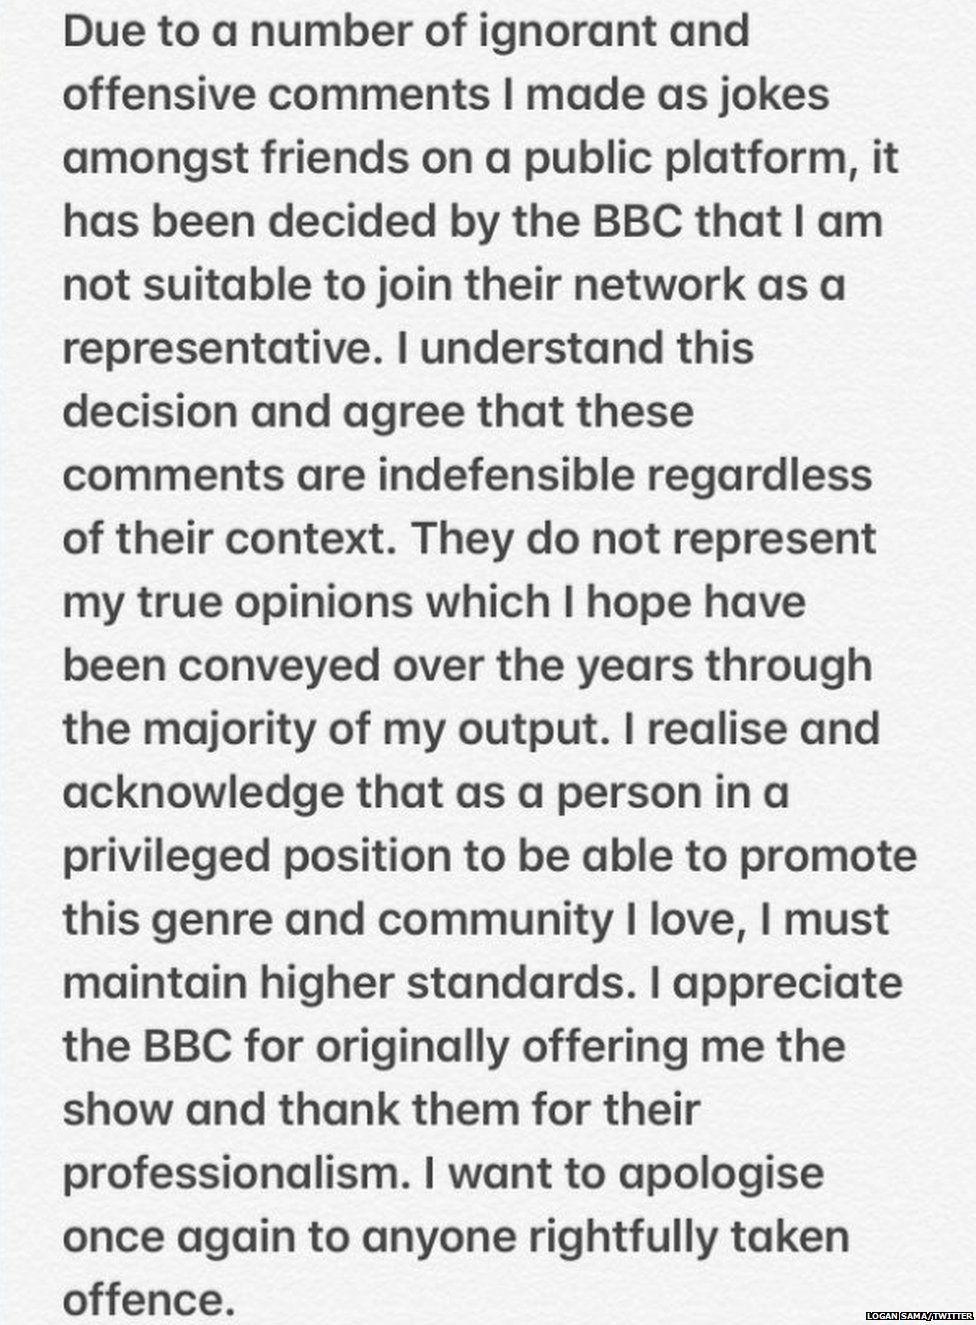 Logan Sama's Twitter statement